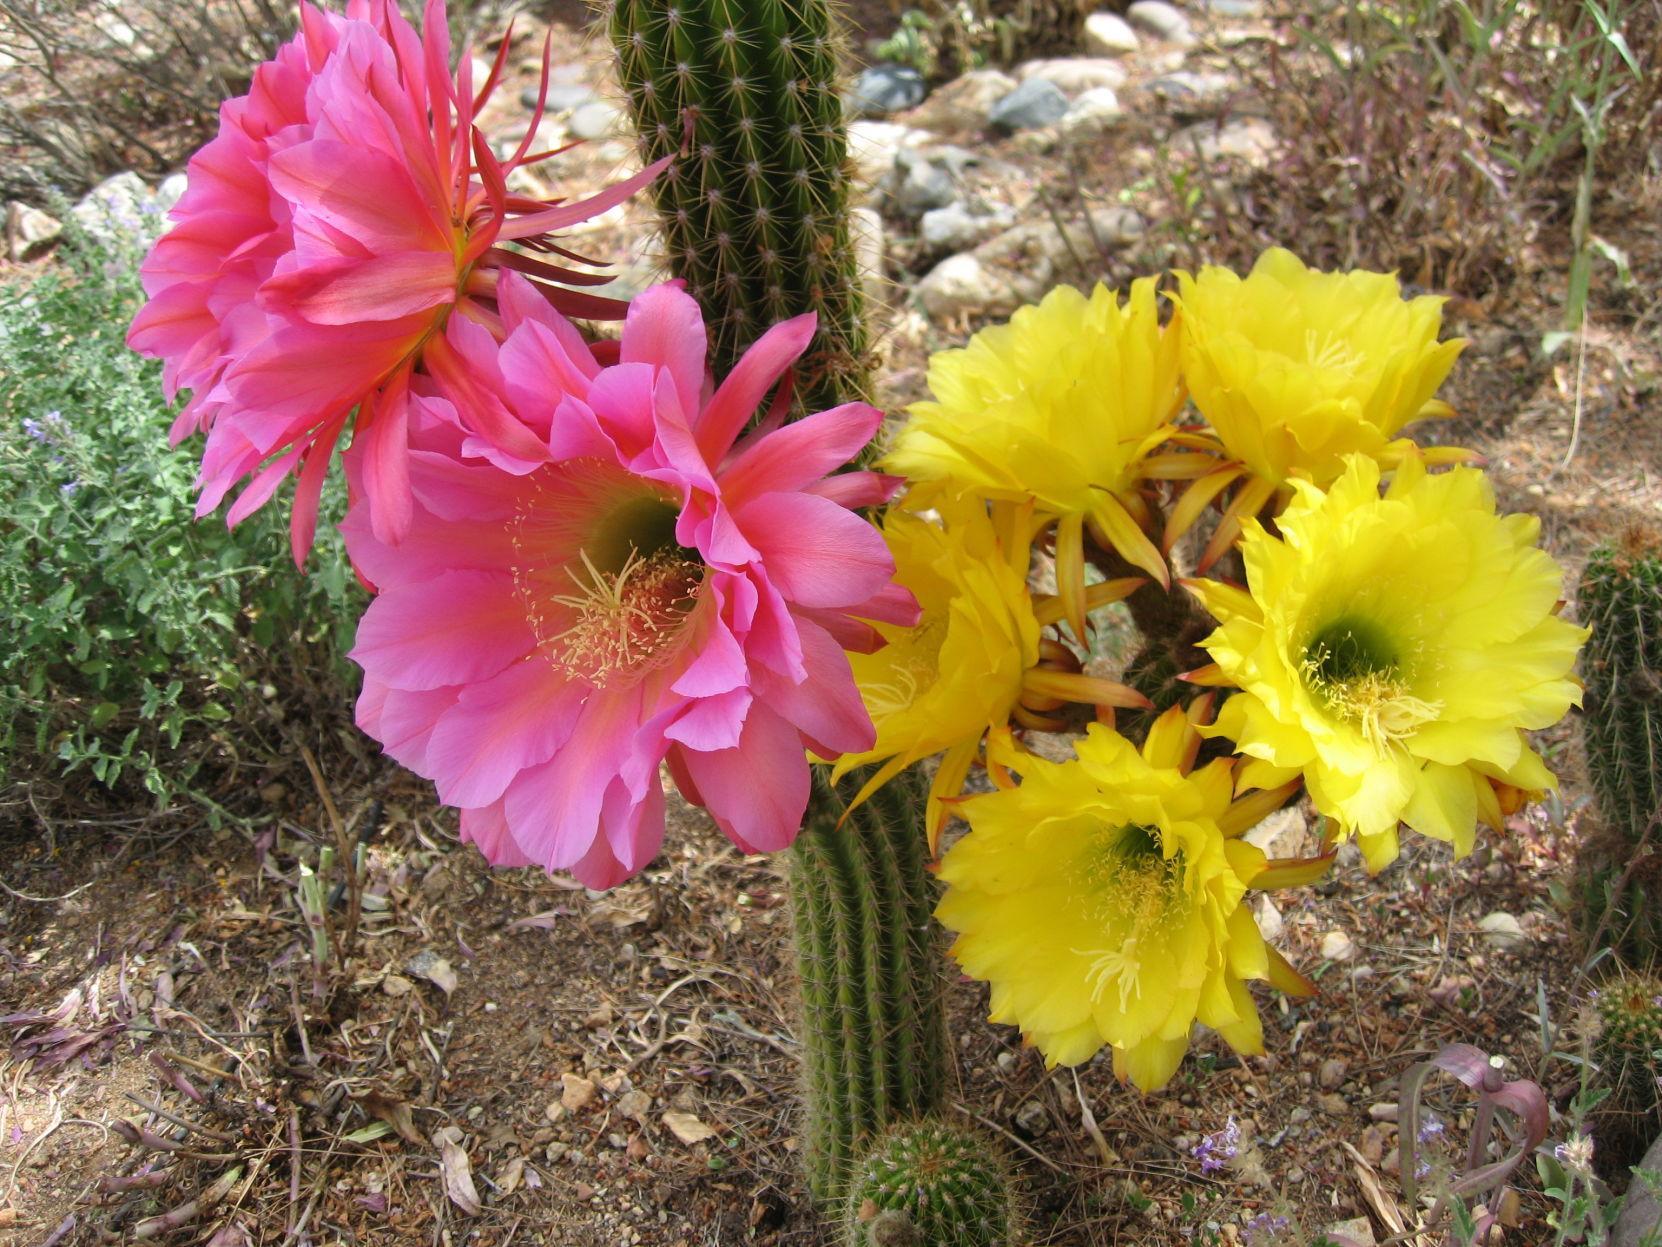 GV Gardeners: Return of colorful Torch Cactus